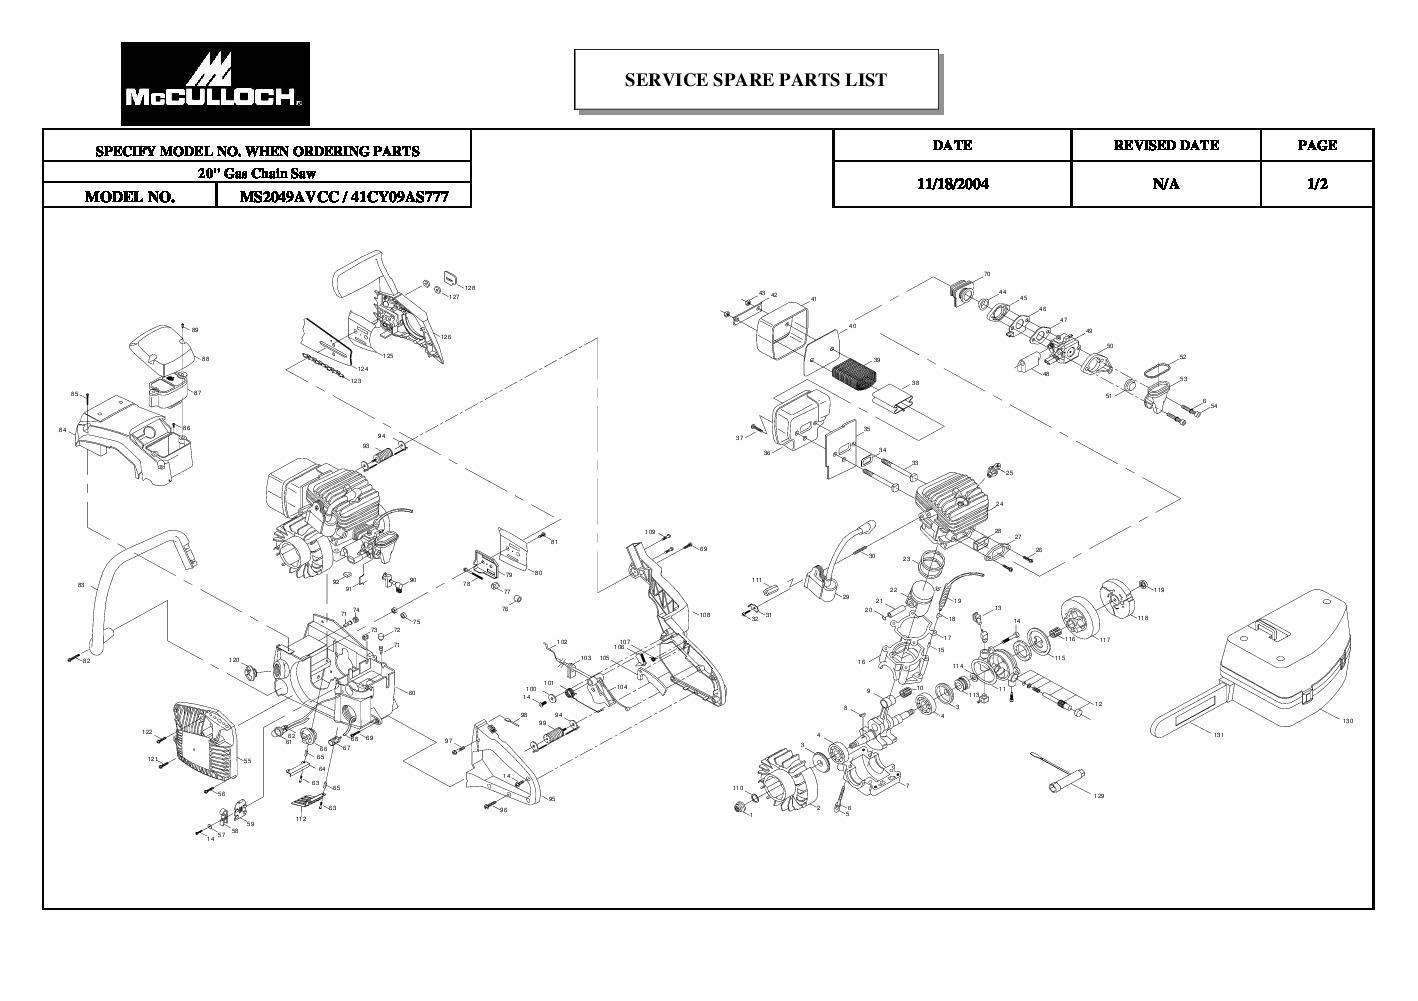 Ms170 Stihl Service Manual